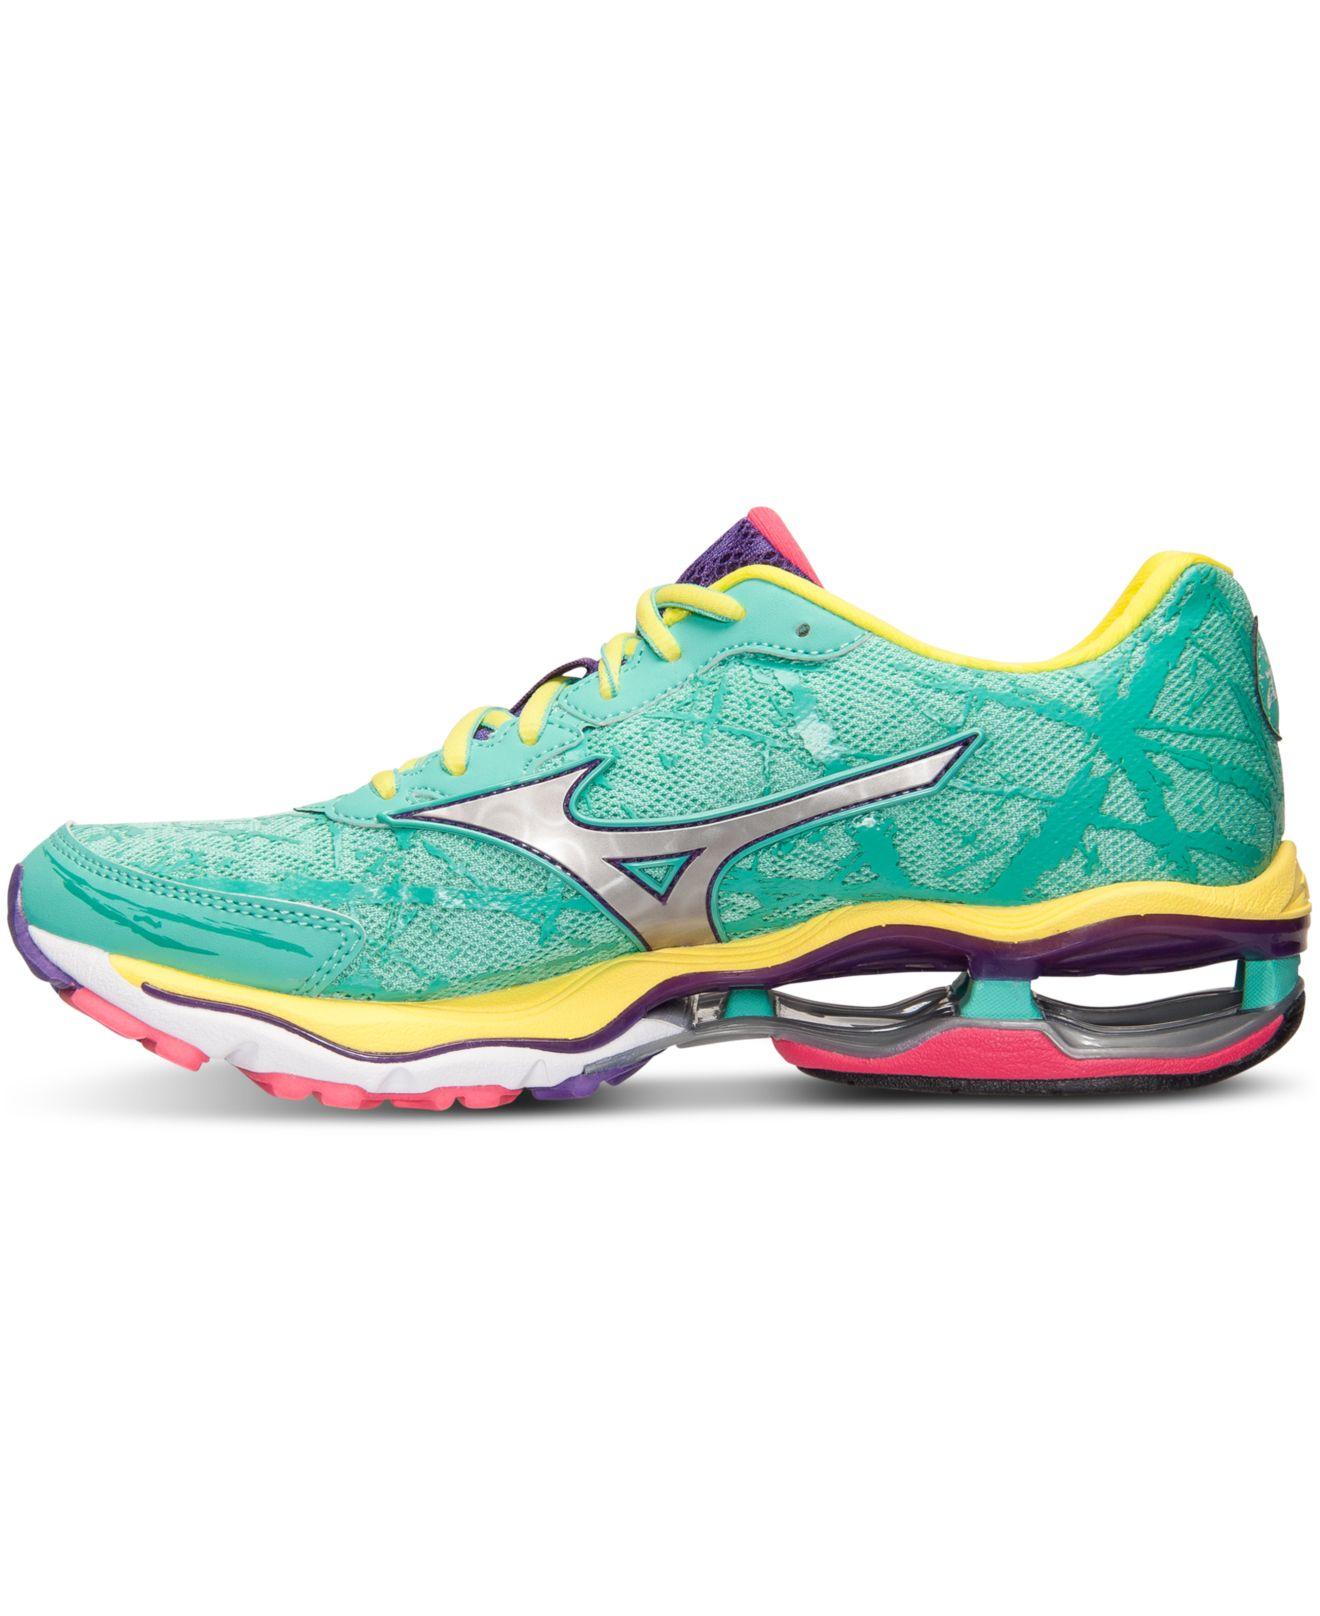 Mizuno Pronation Running Shoe